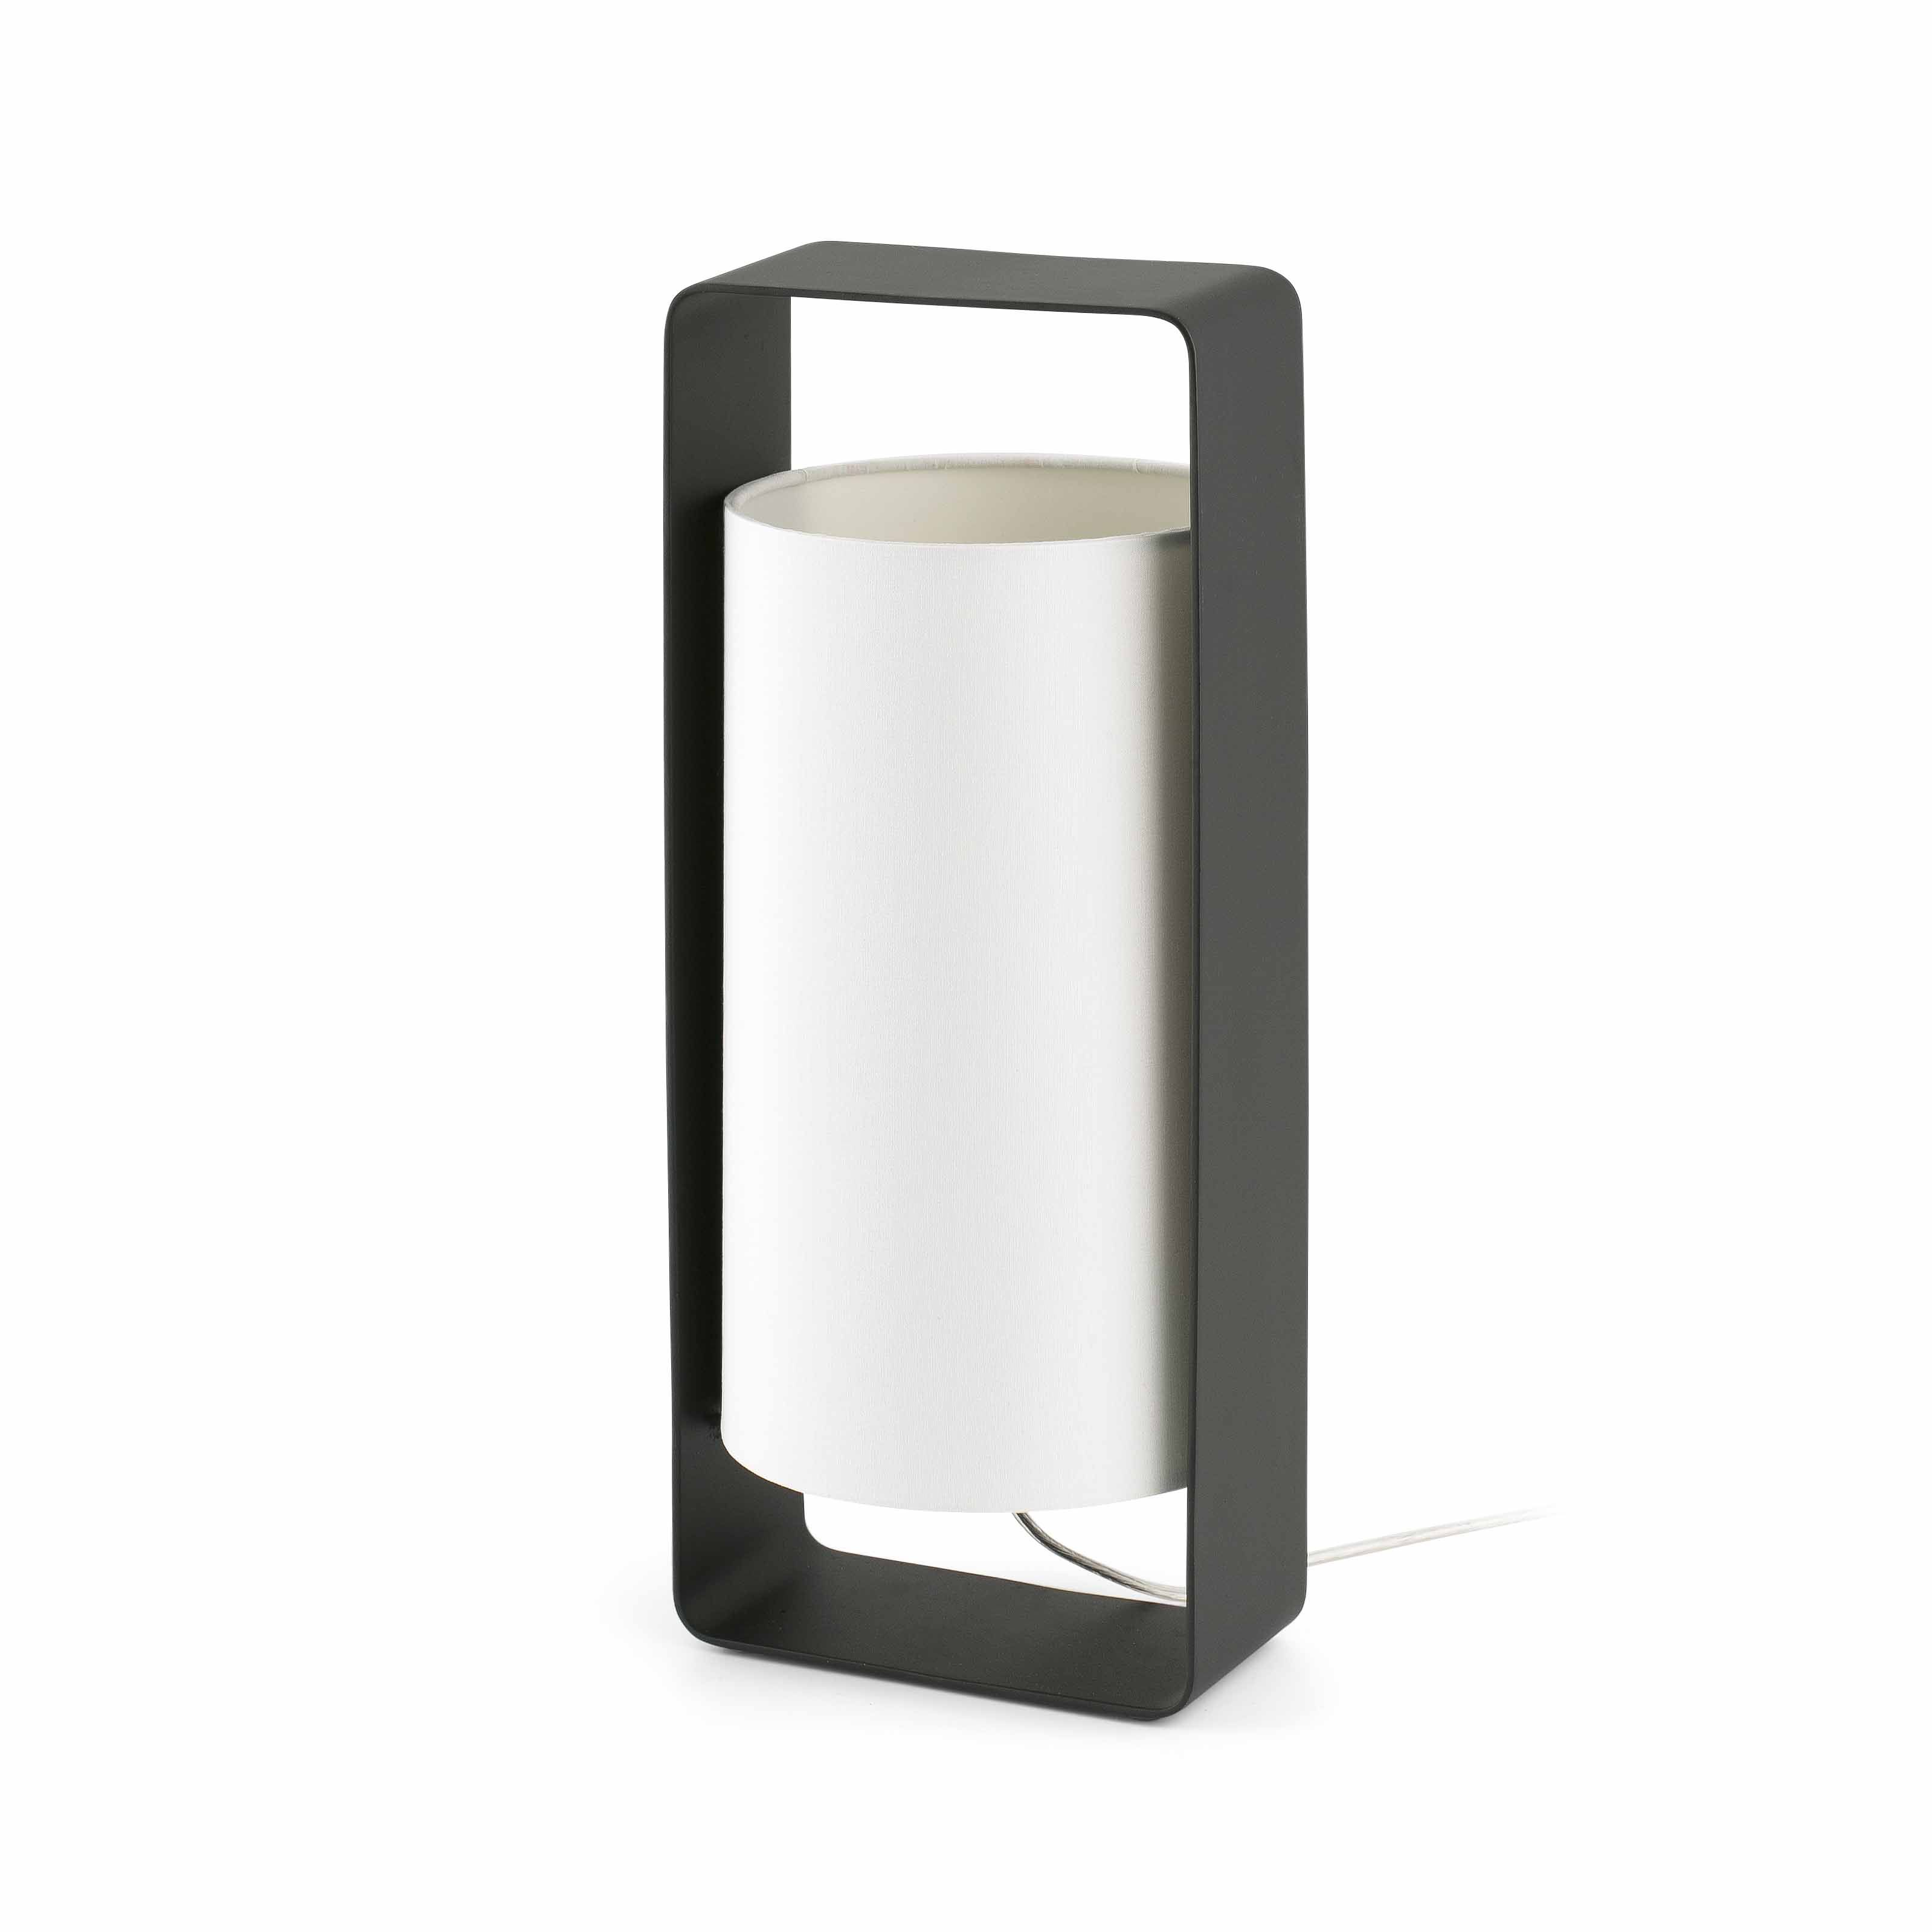 Black White Designed Lamp Lula By Marina Mila Lamparas De Mesa Ventiladores De Techo Iluminacion Interior